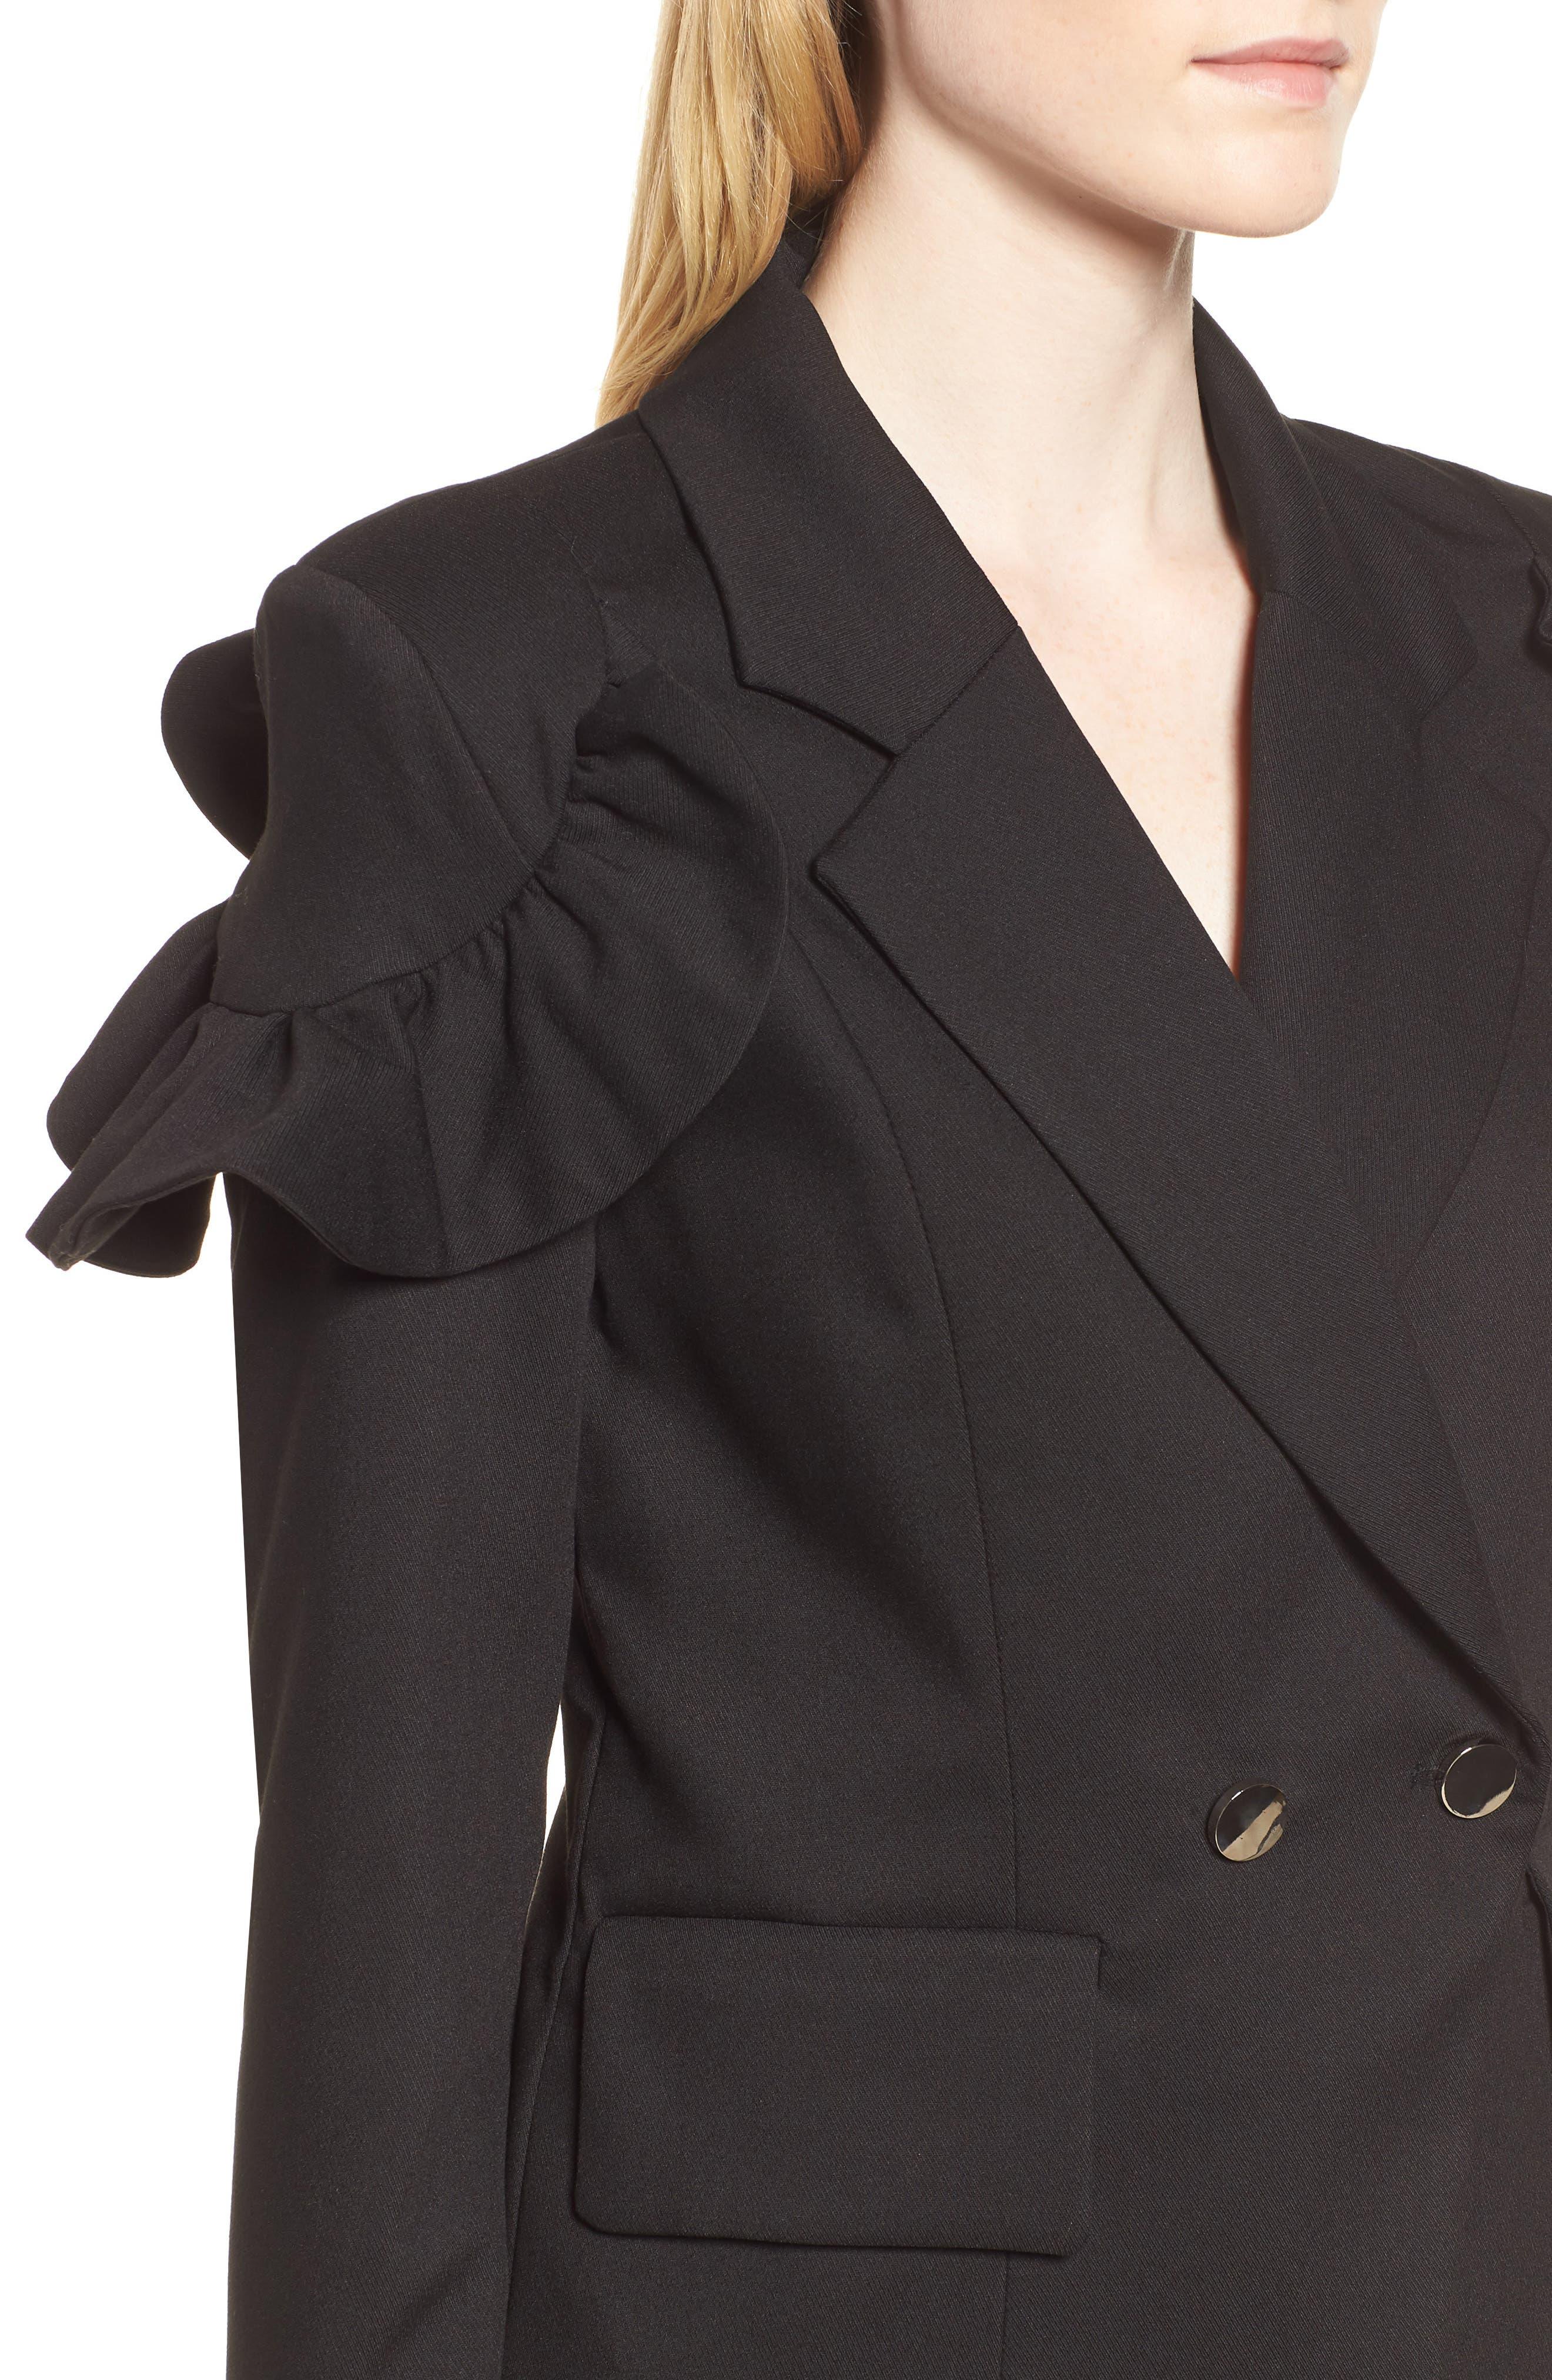 Harmony Jacket,                             Alternate thumbnail 4, color,                             Black